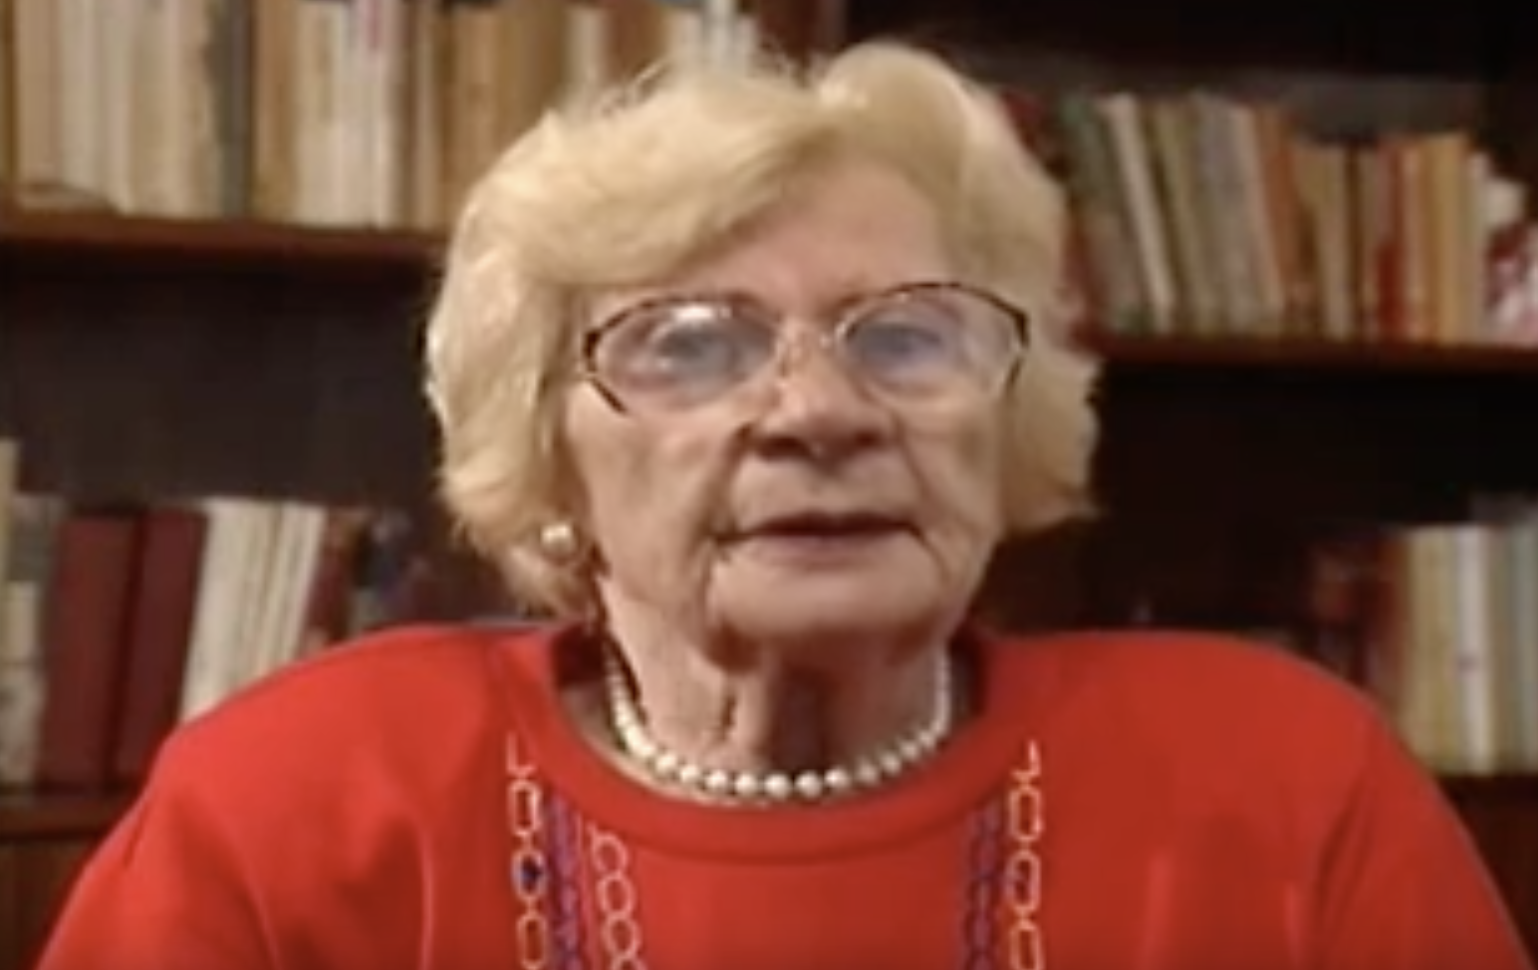 Irenehorowitz